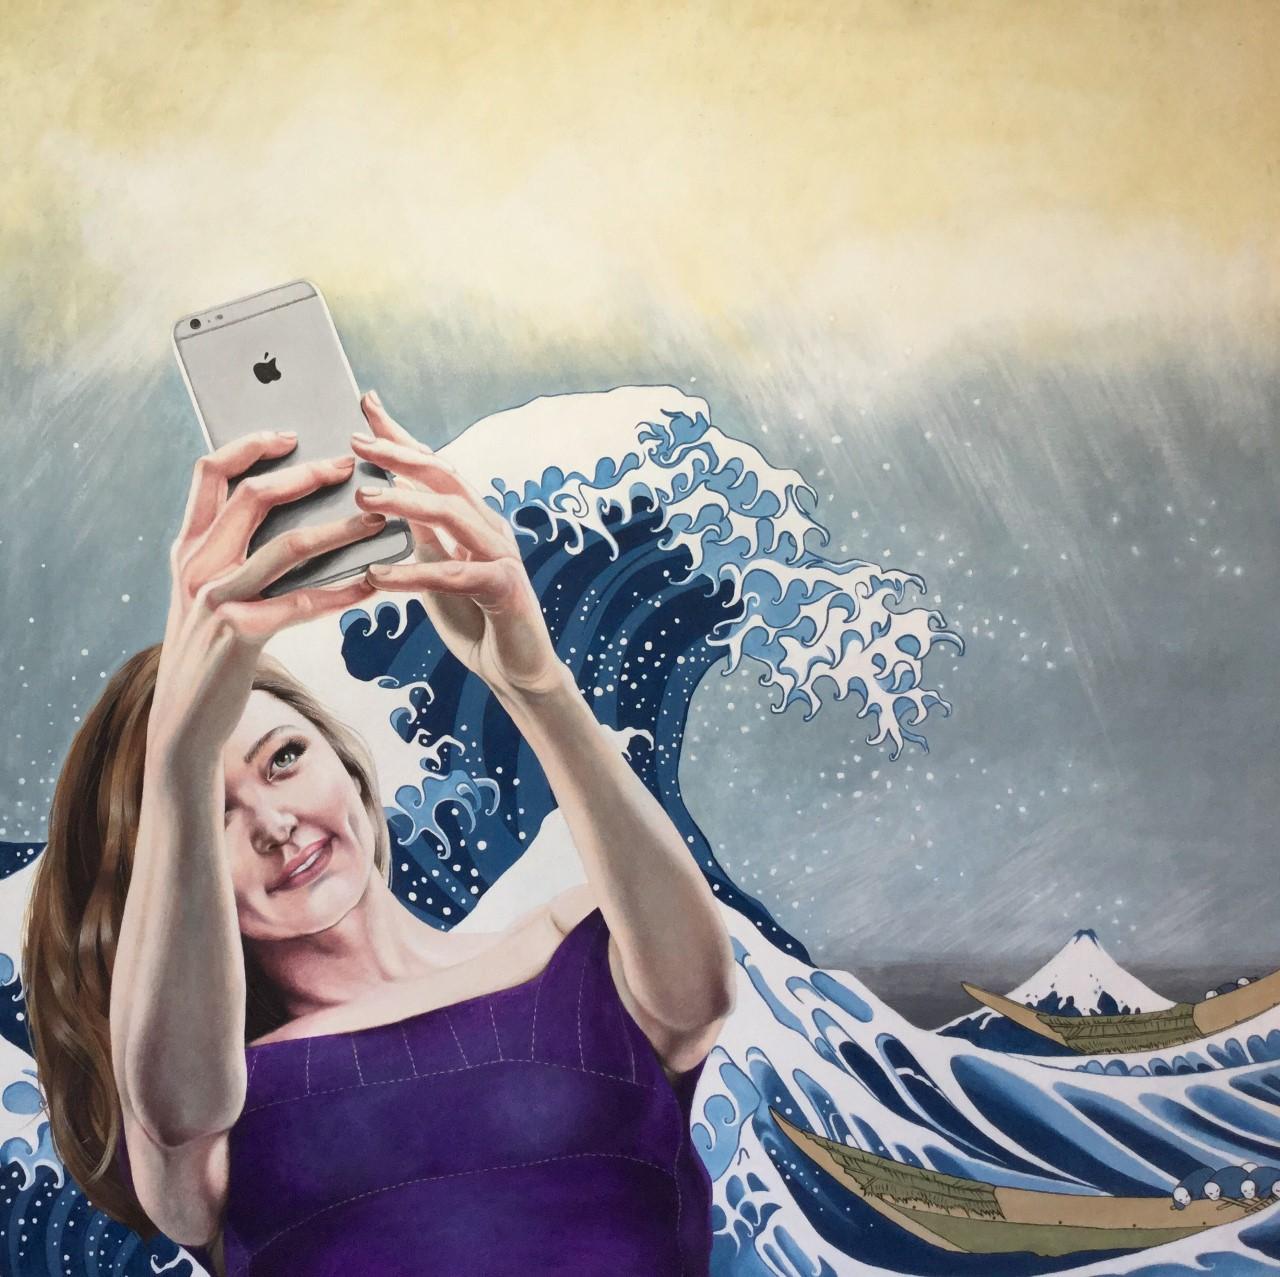 Gran selfie japonés. 2017